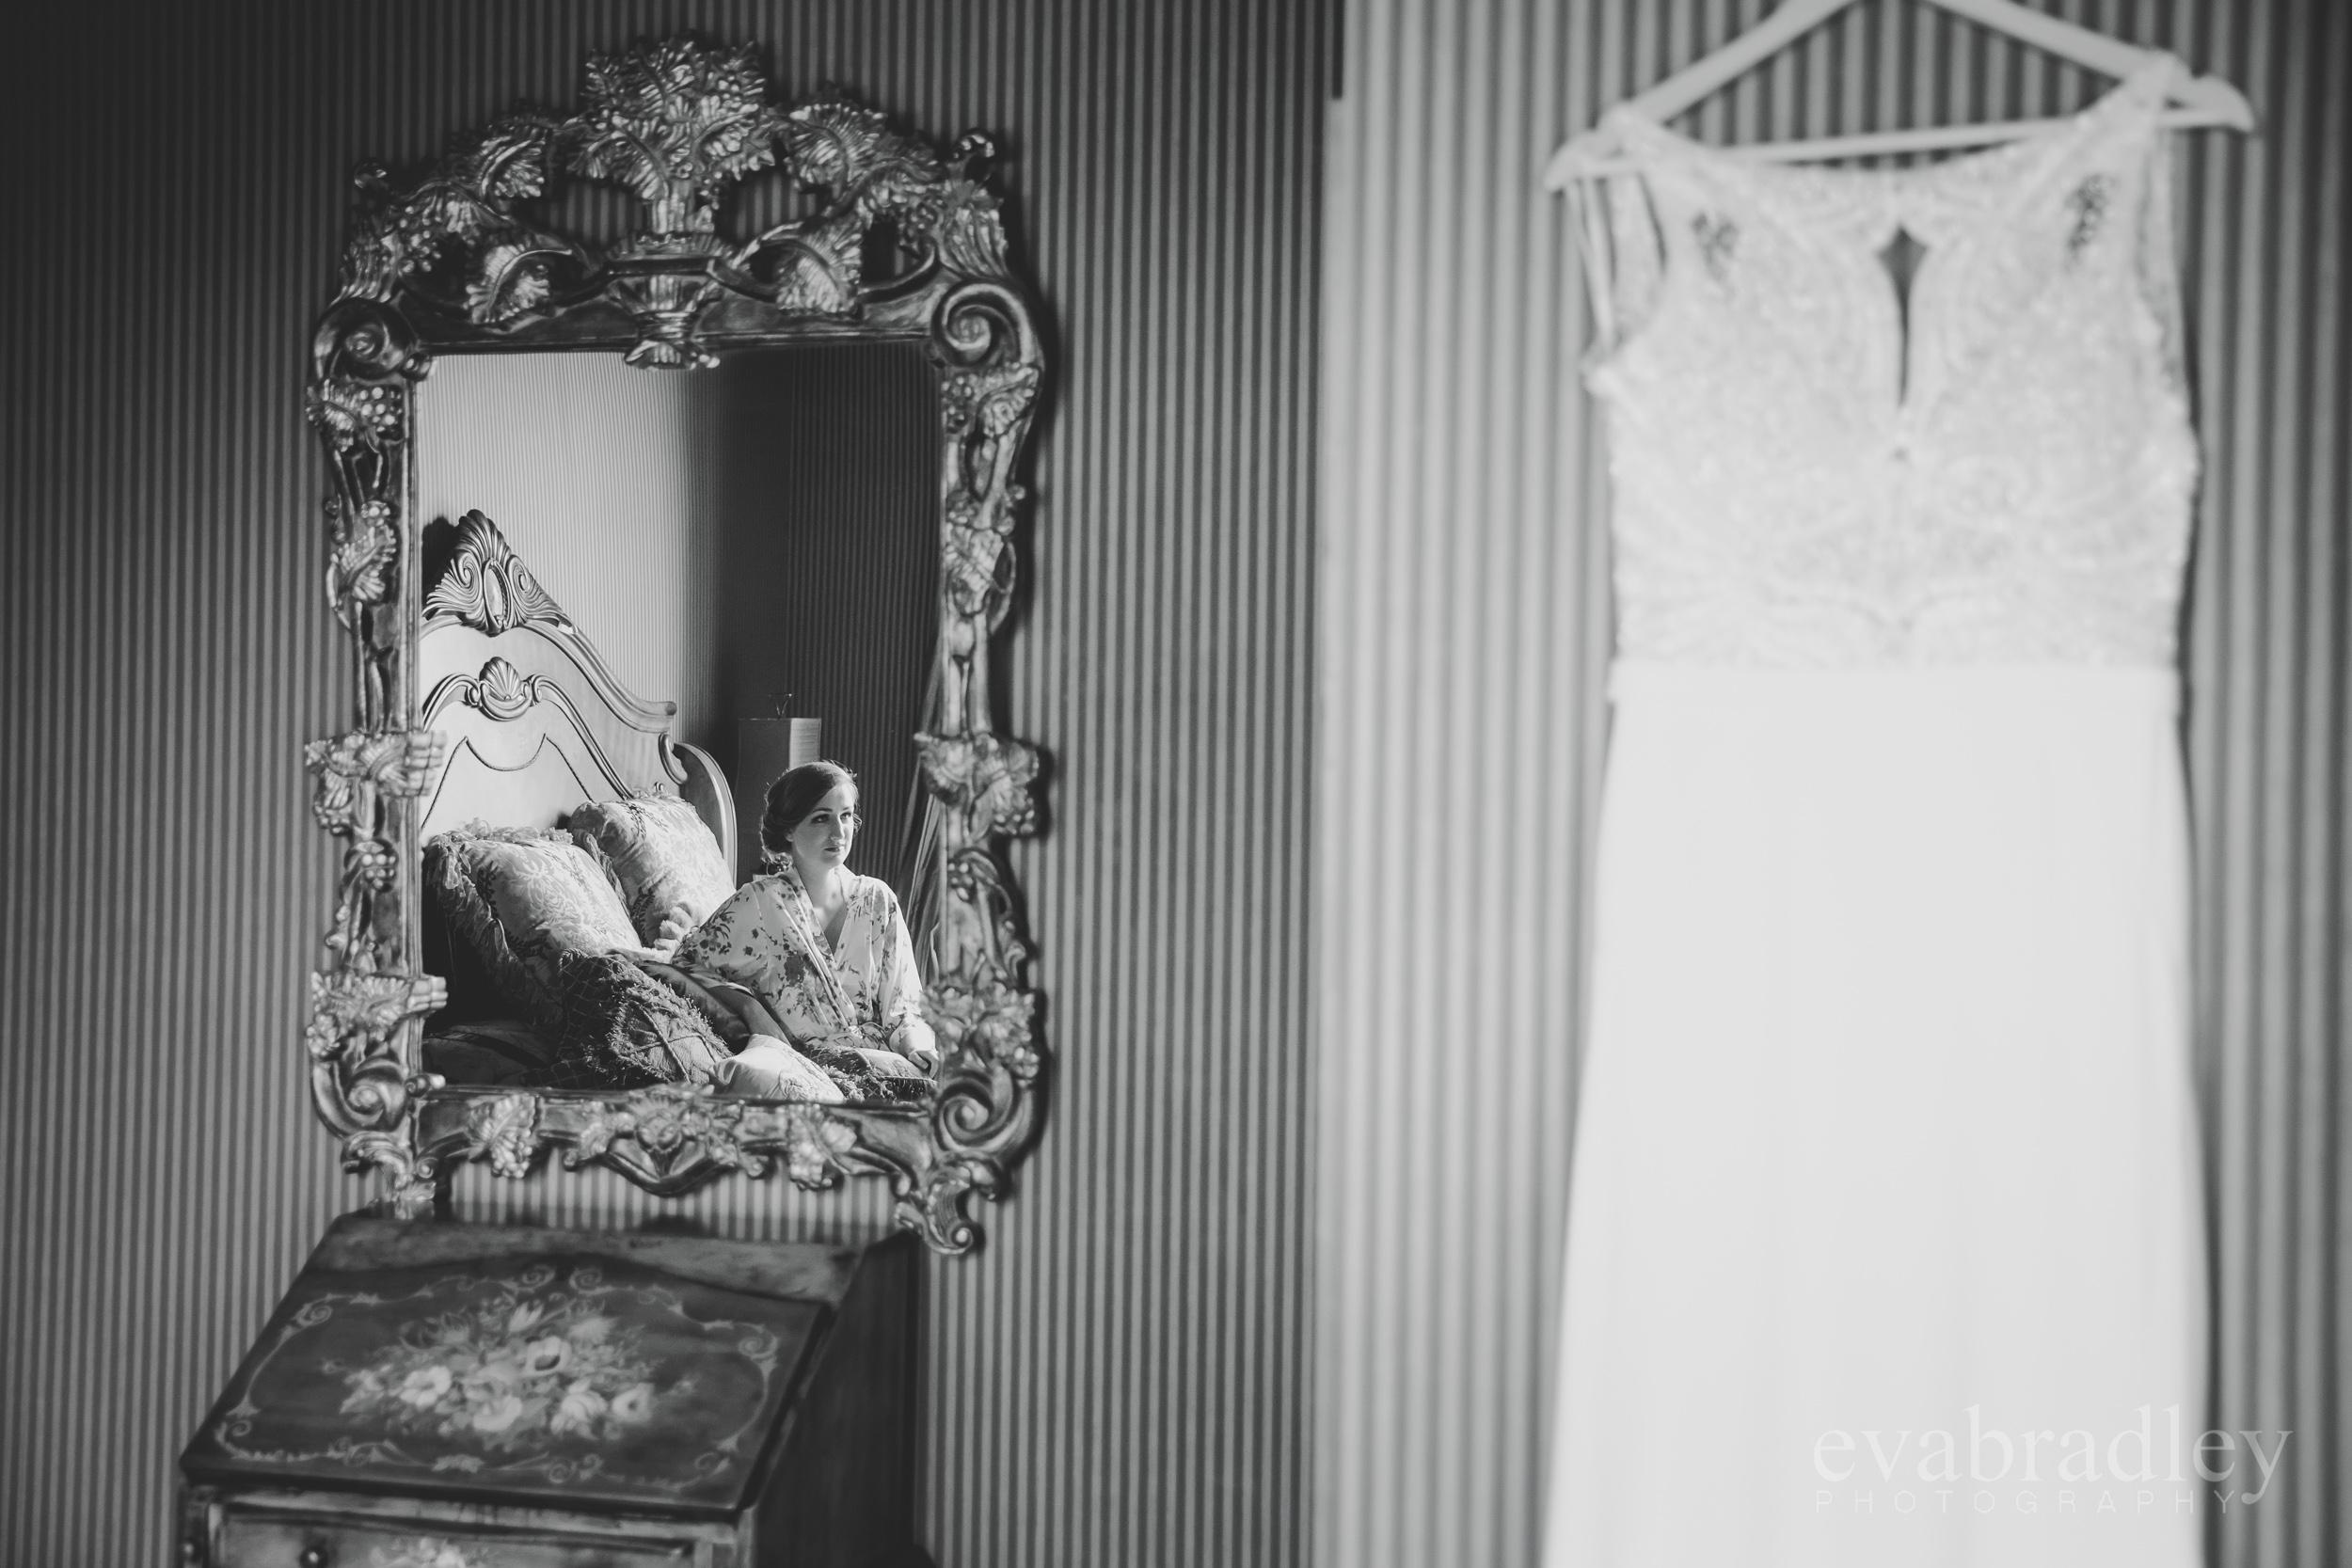 hawkes-bay-weddings-8.jpg